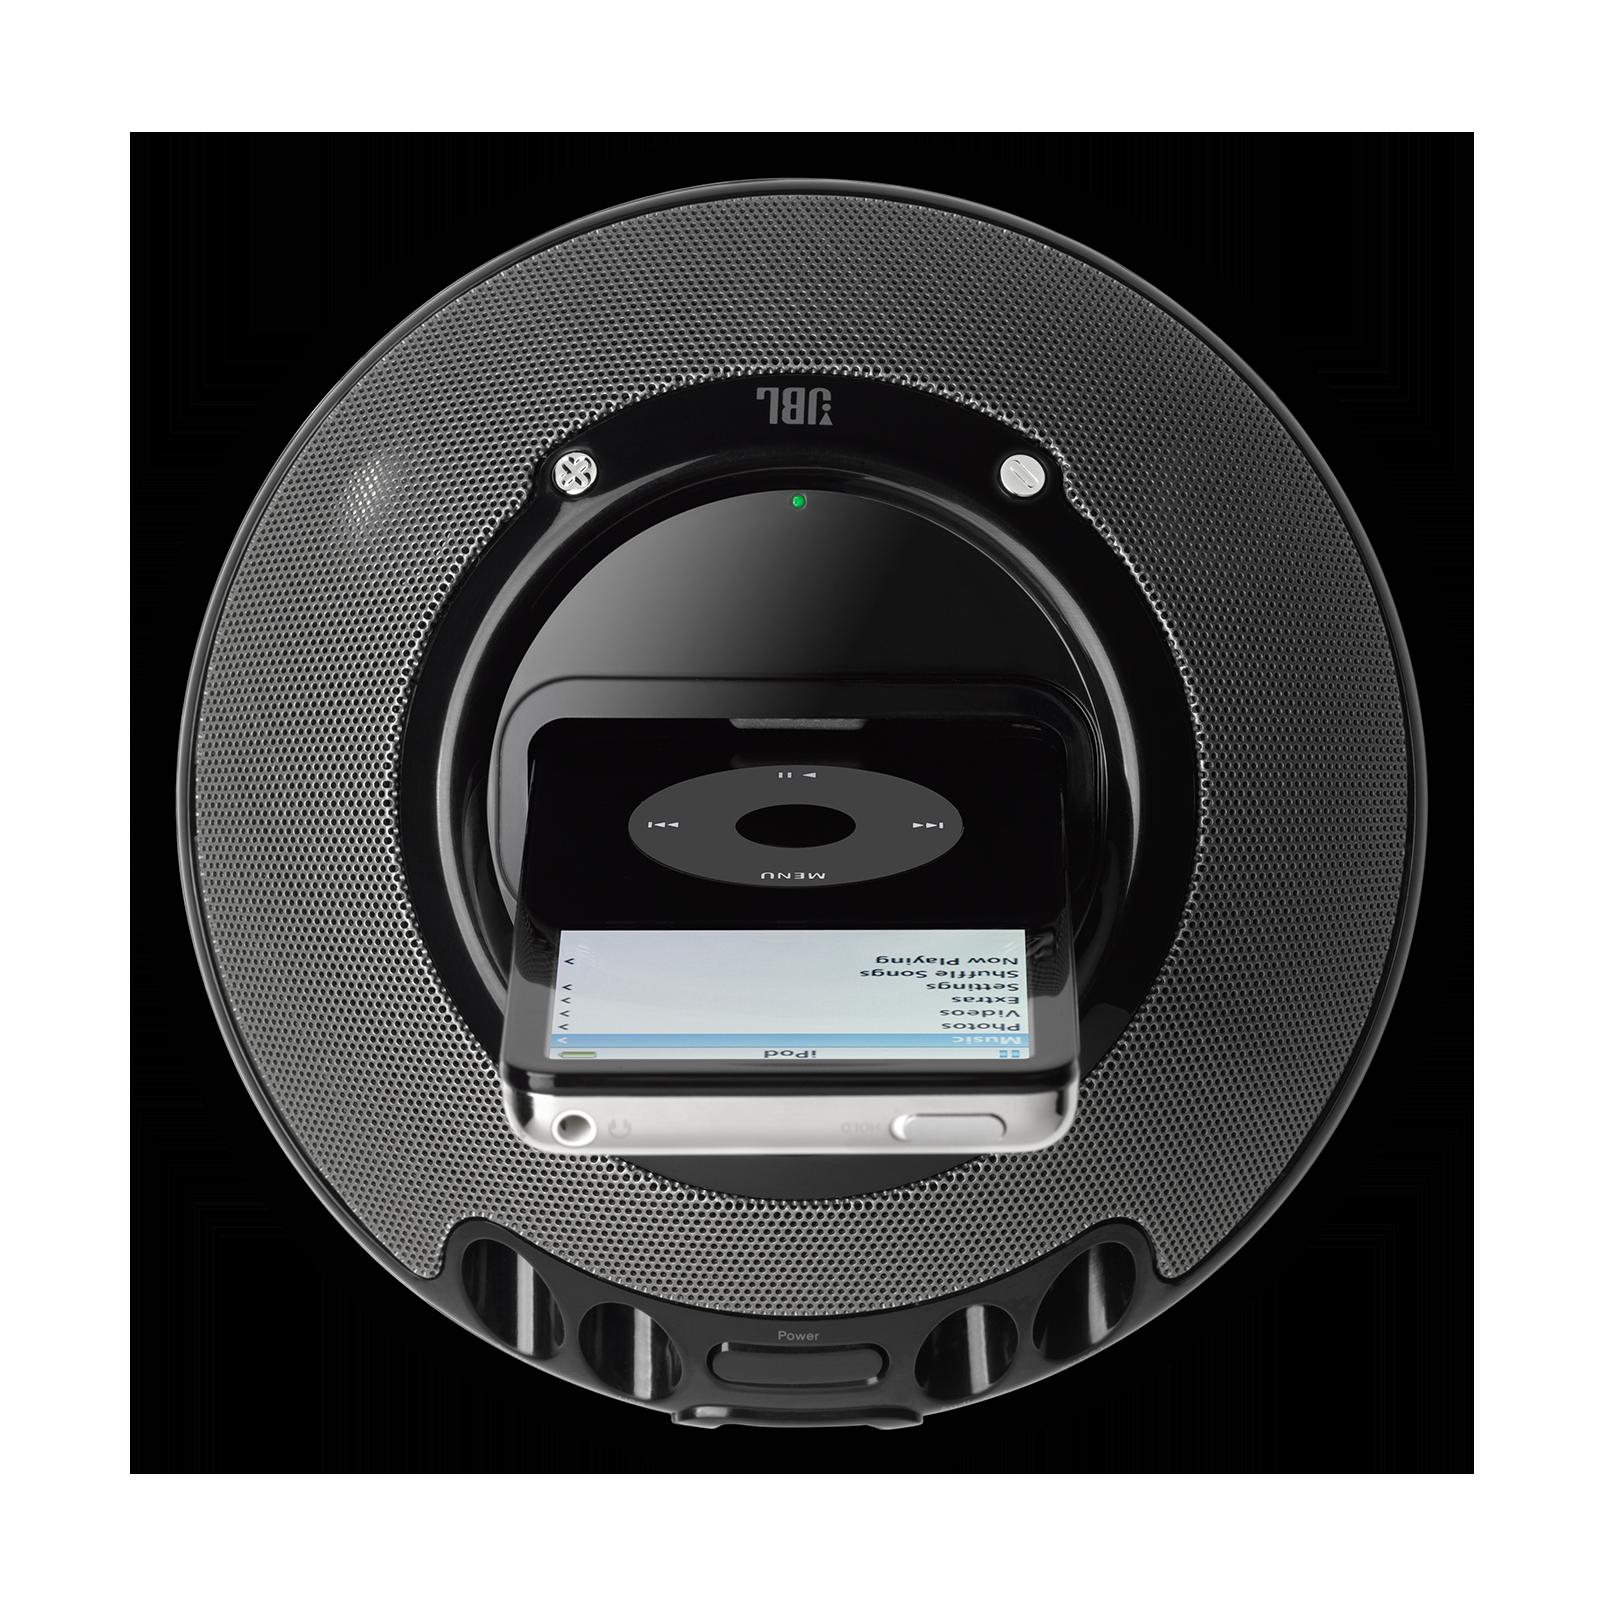 jbl on stage micro portable loudspeaker dock for ipod rh jbl com JBL On Stage Speaker Dock jbl on stage manual pdf